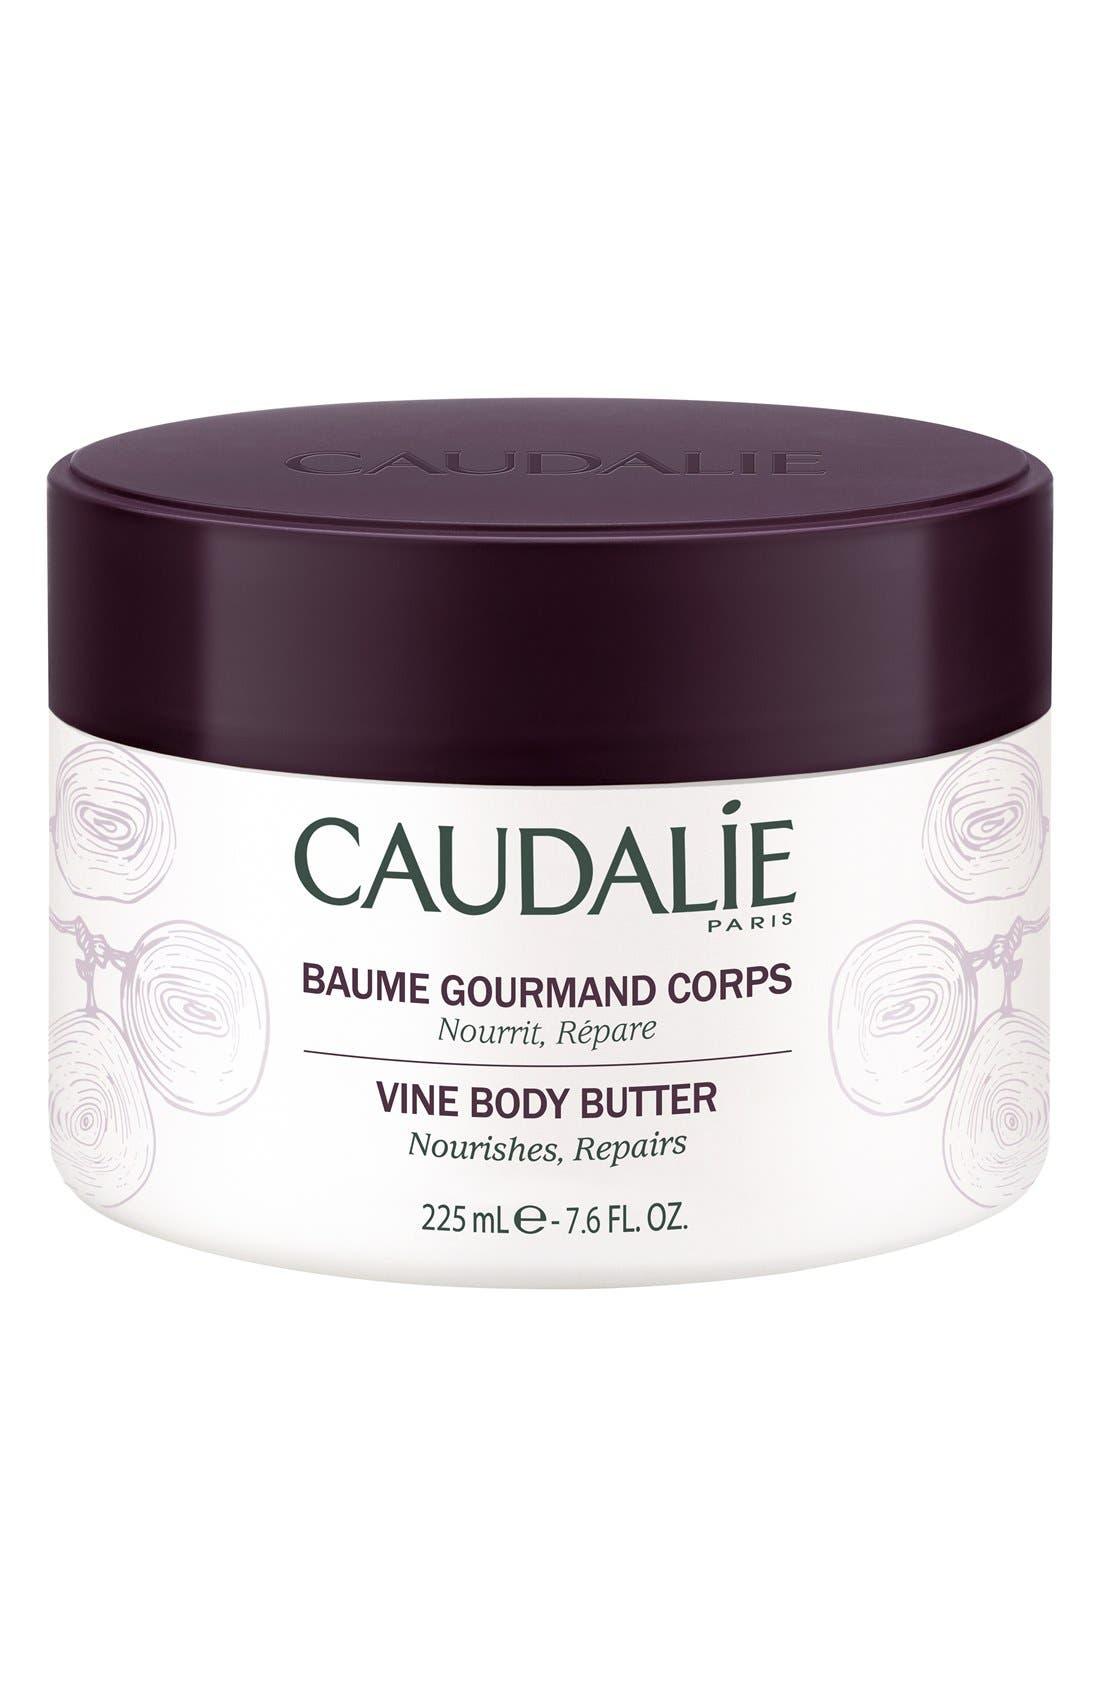 CAUDALÍE Vine Body Butter